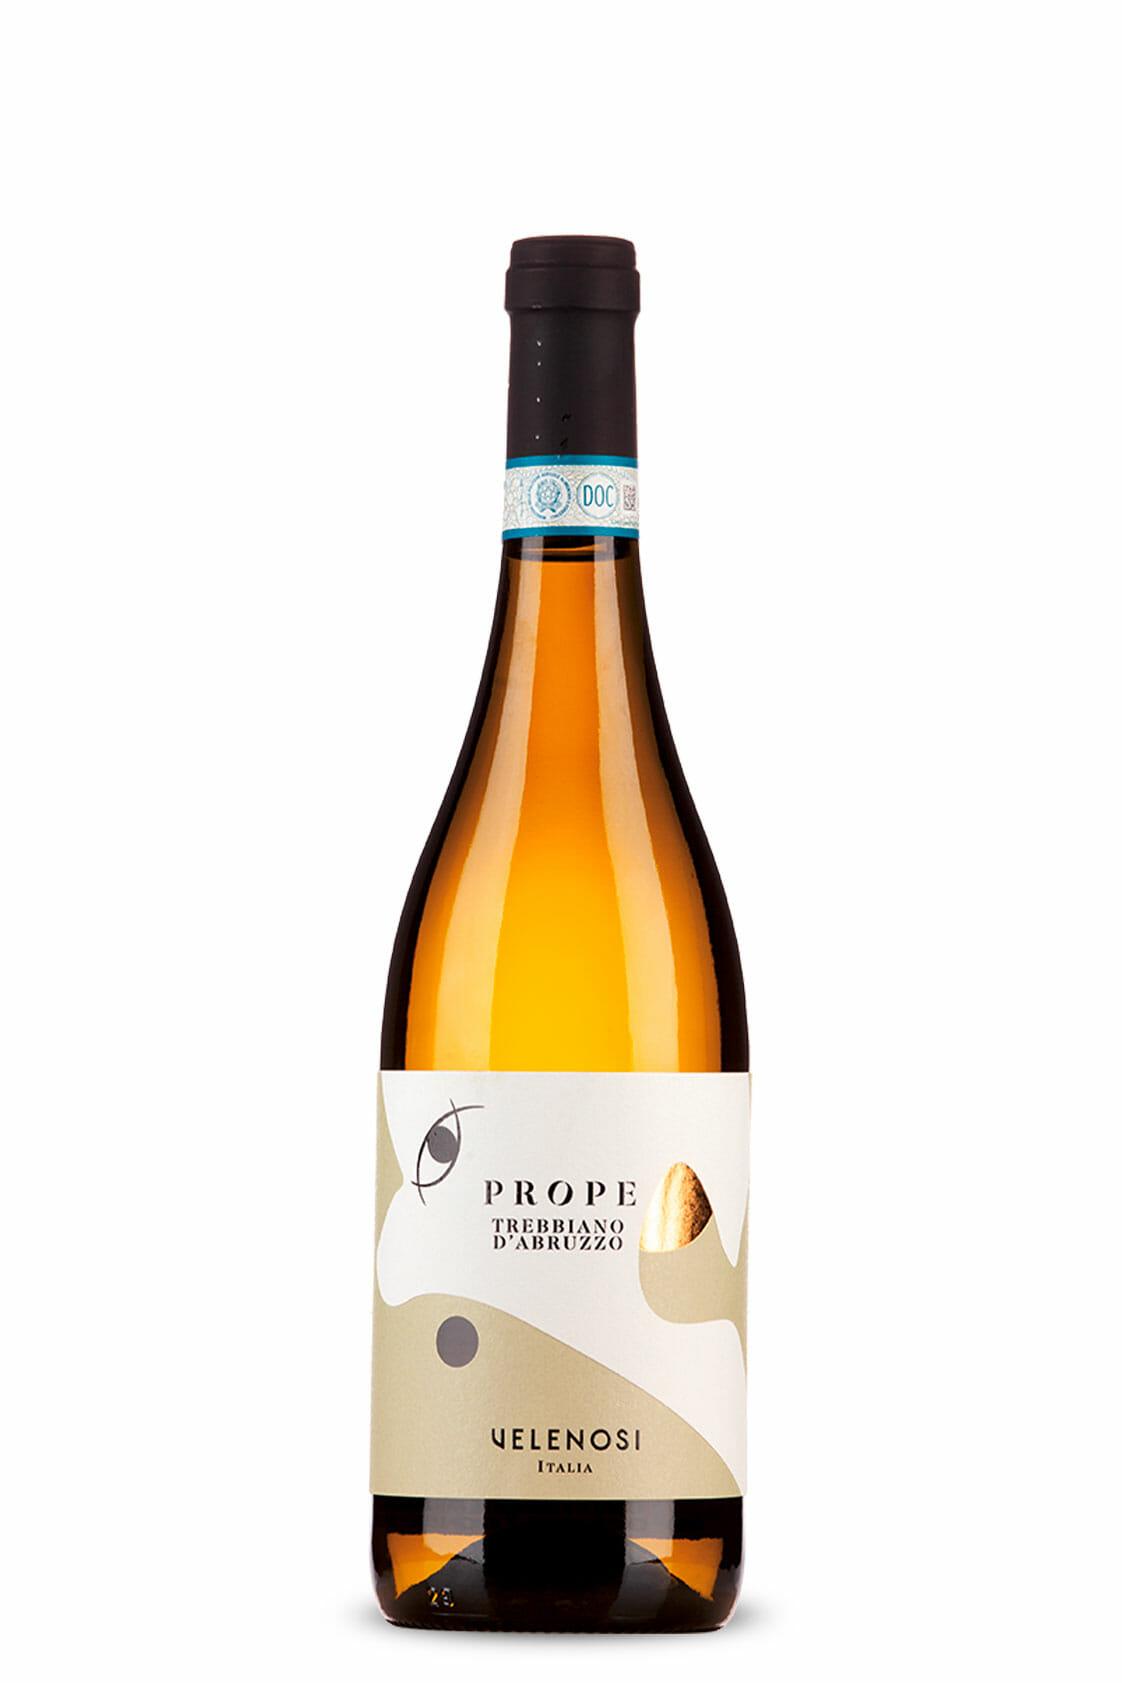 Prope Trebbiano d'Abruzzo 2018 – Velenosi Vini